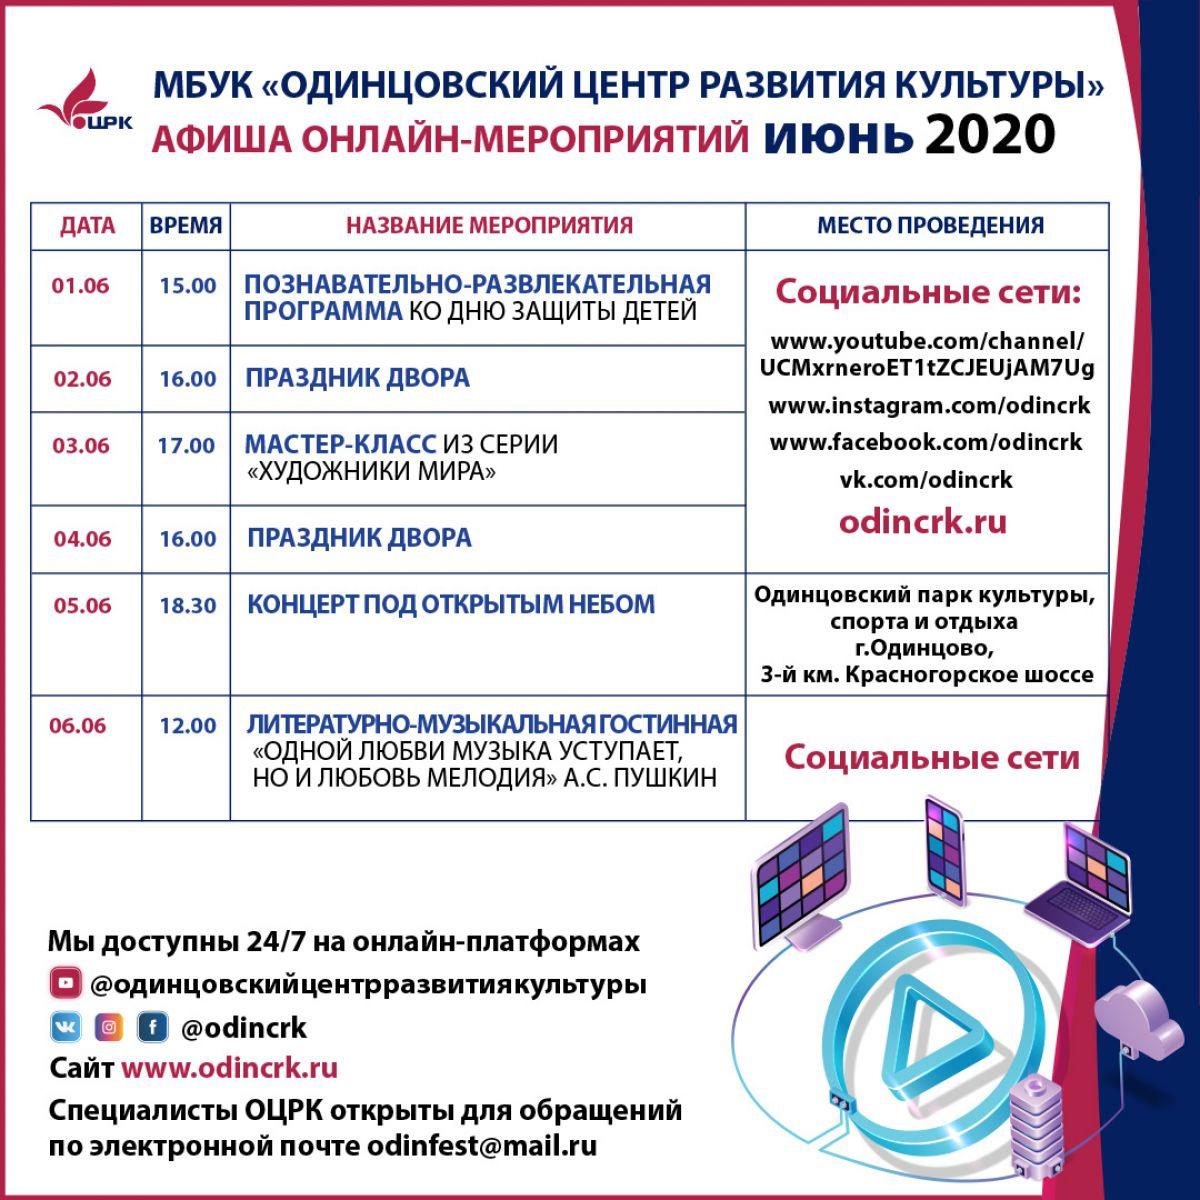 Афиша онлайн-мероприятий ИЮНЬ'2020